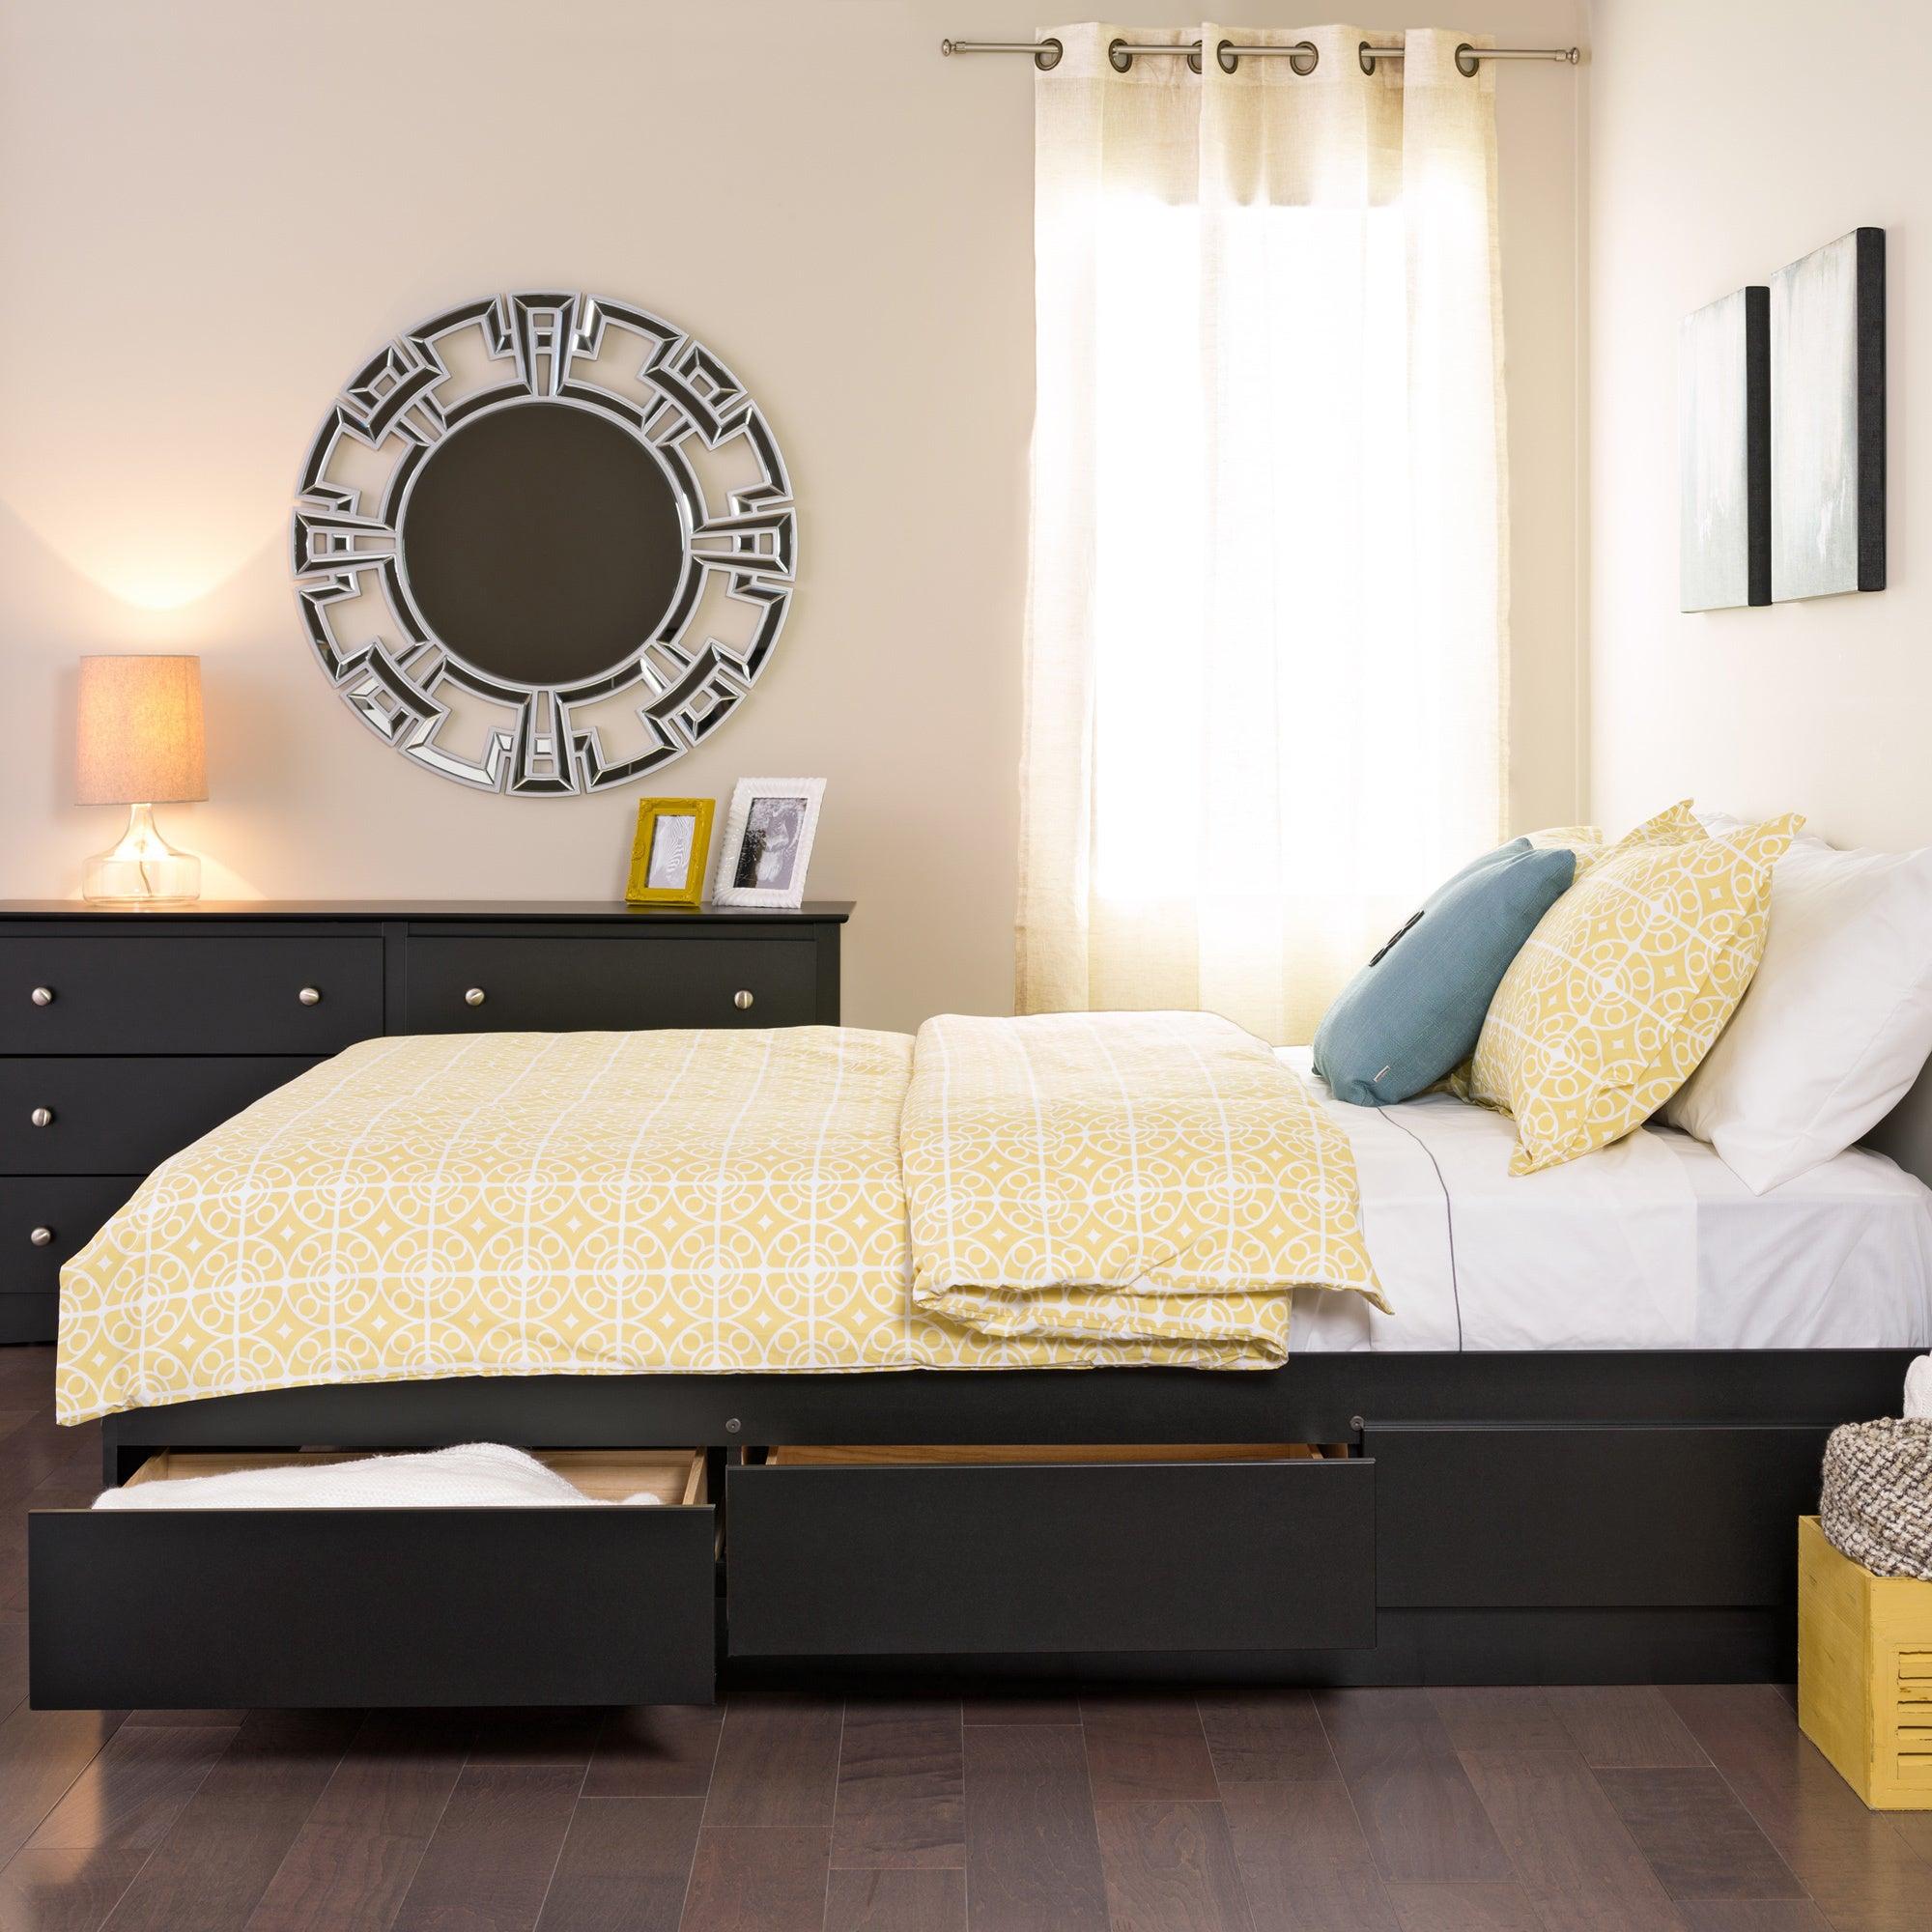 Shop Black Queen Mates 6 Drawer Platform Storage Bed Free